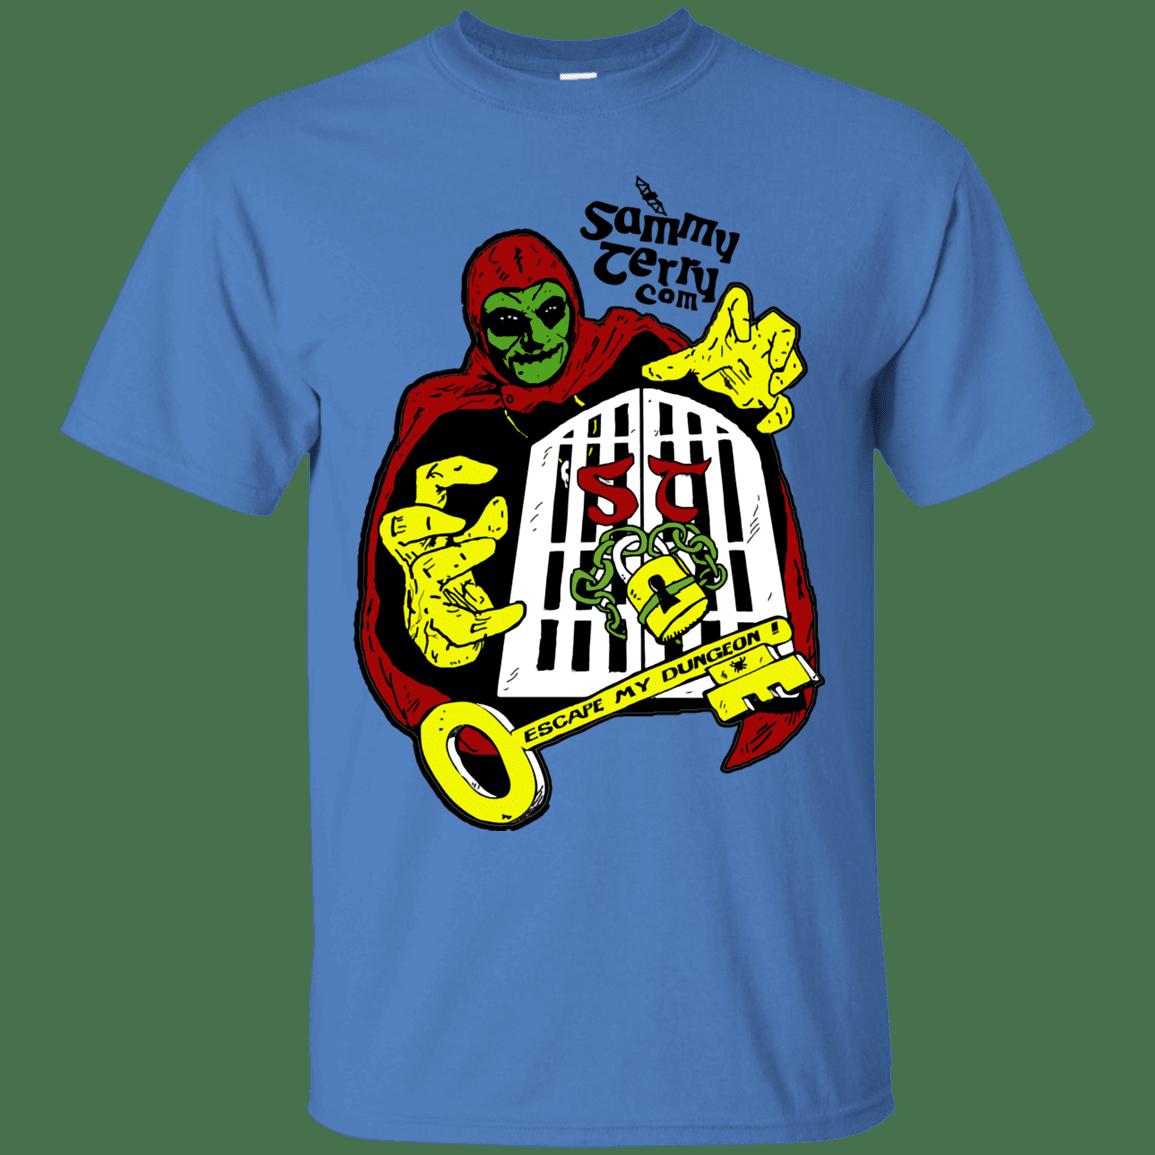 Escape Room Asstd Colored T-Shirt - Sammy Terry